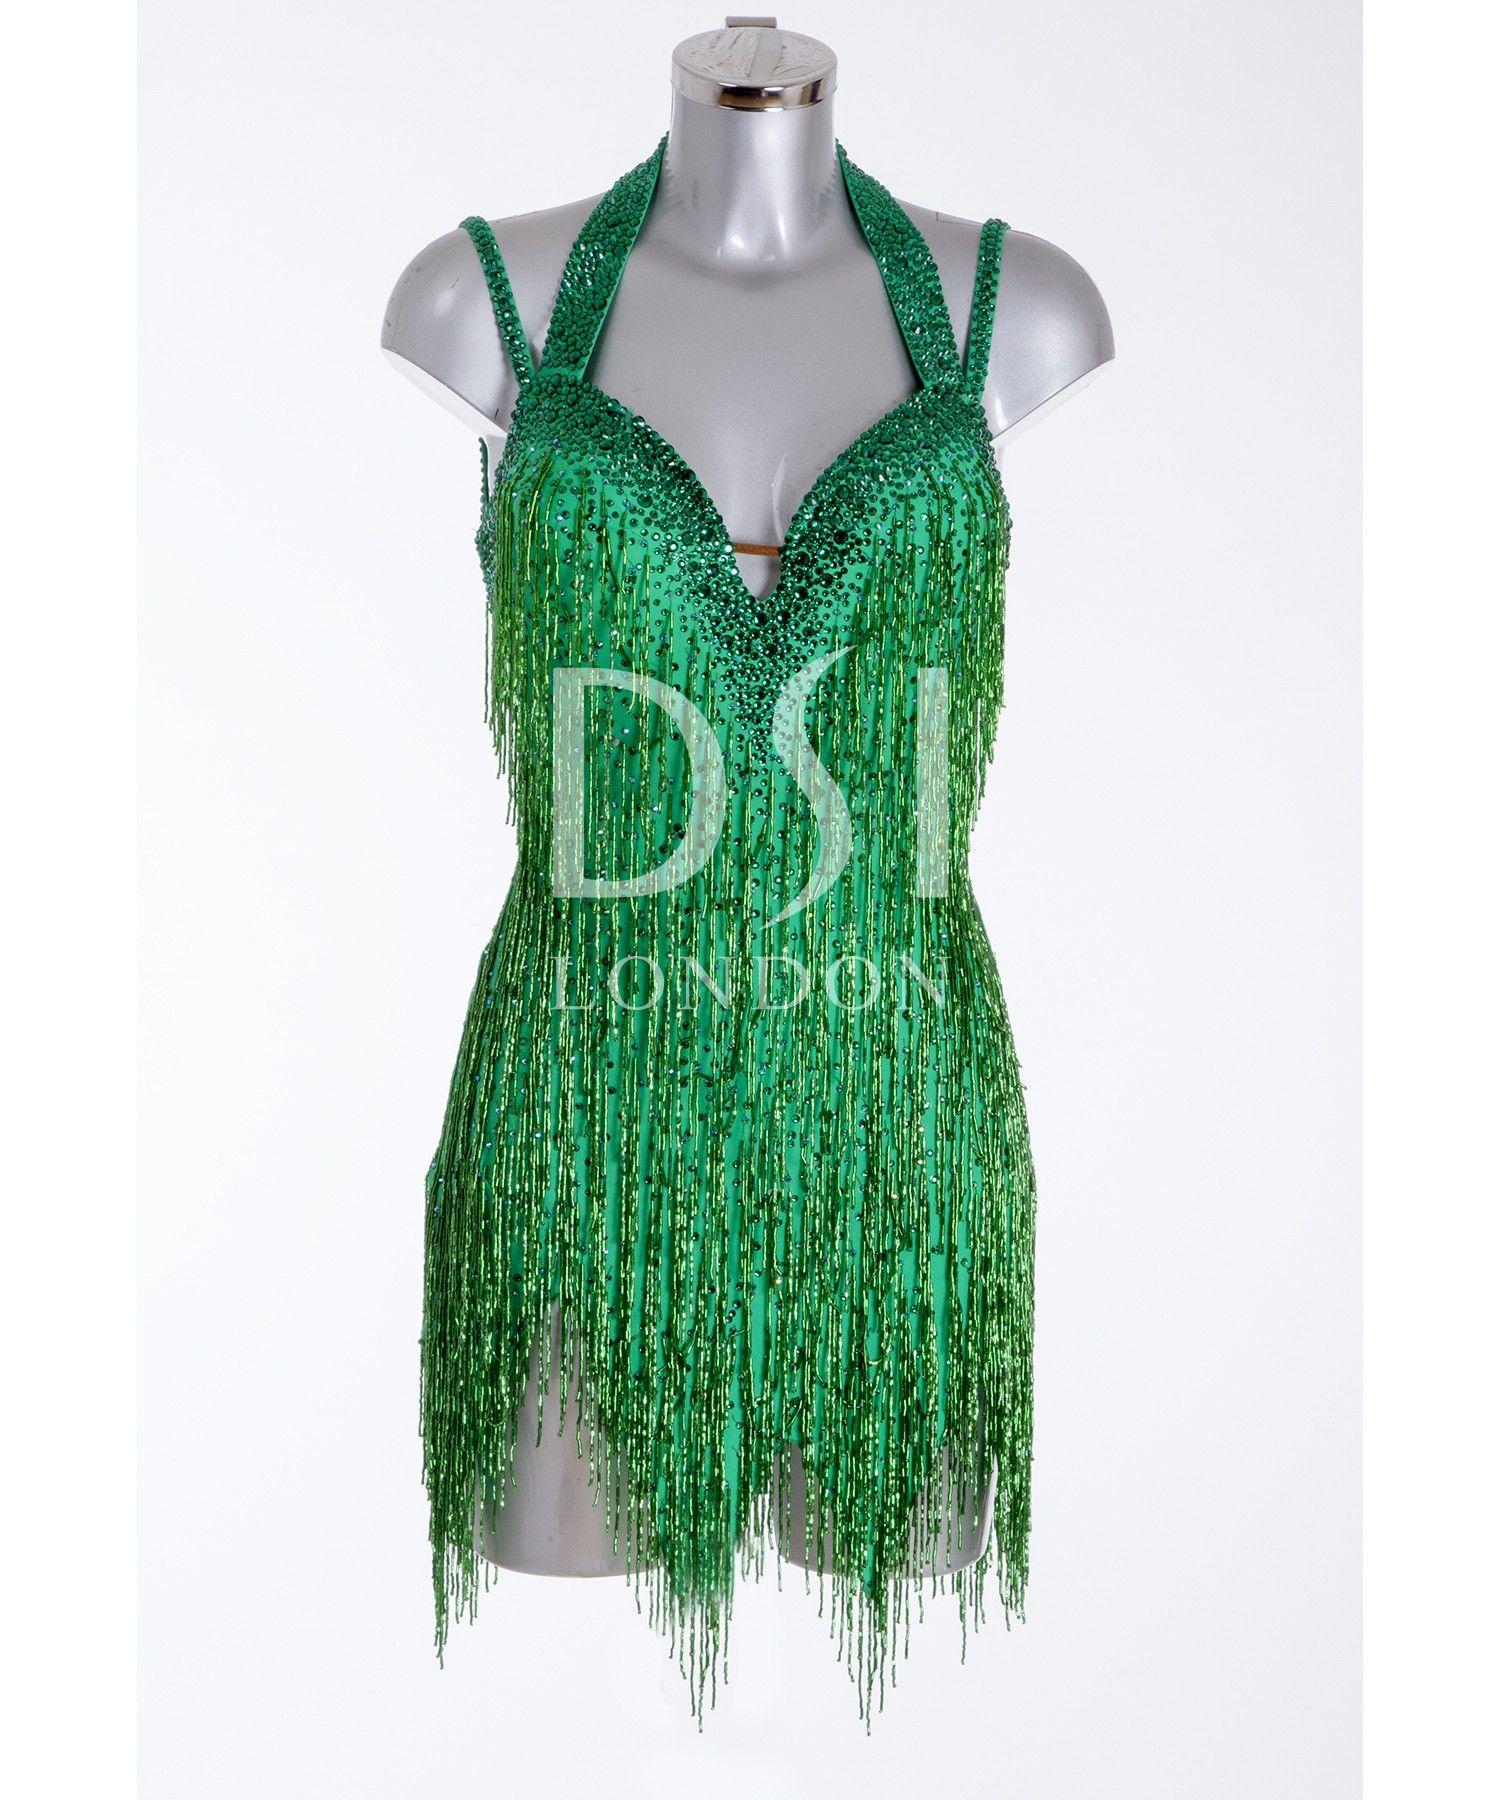 377bcf44e4883 393844 Emerald Latin Dress | Latin dresses for sale | Dance dresses for  sale | Ladies | DSI London